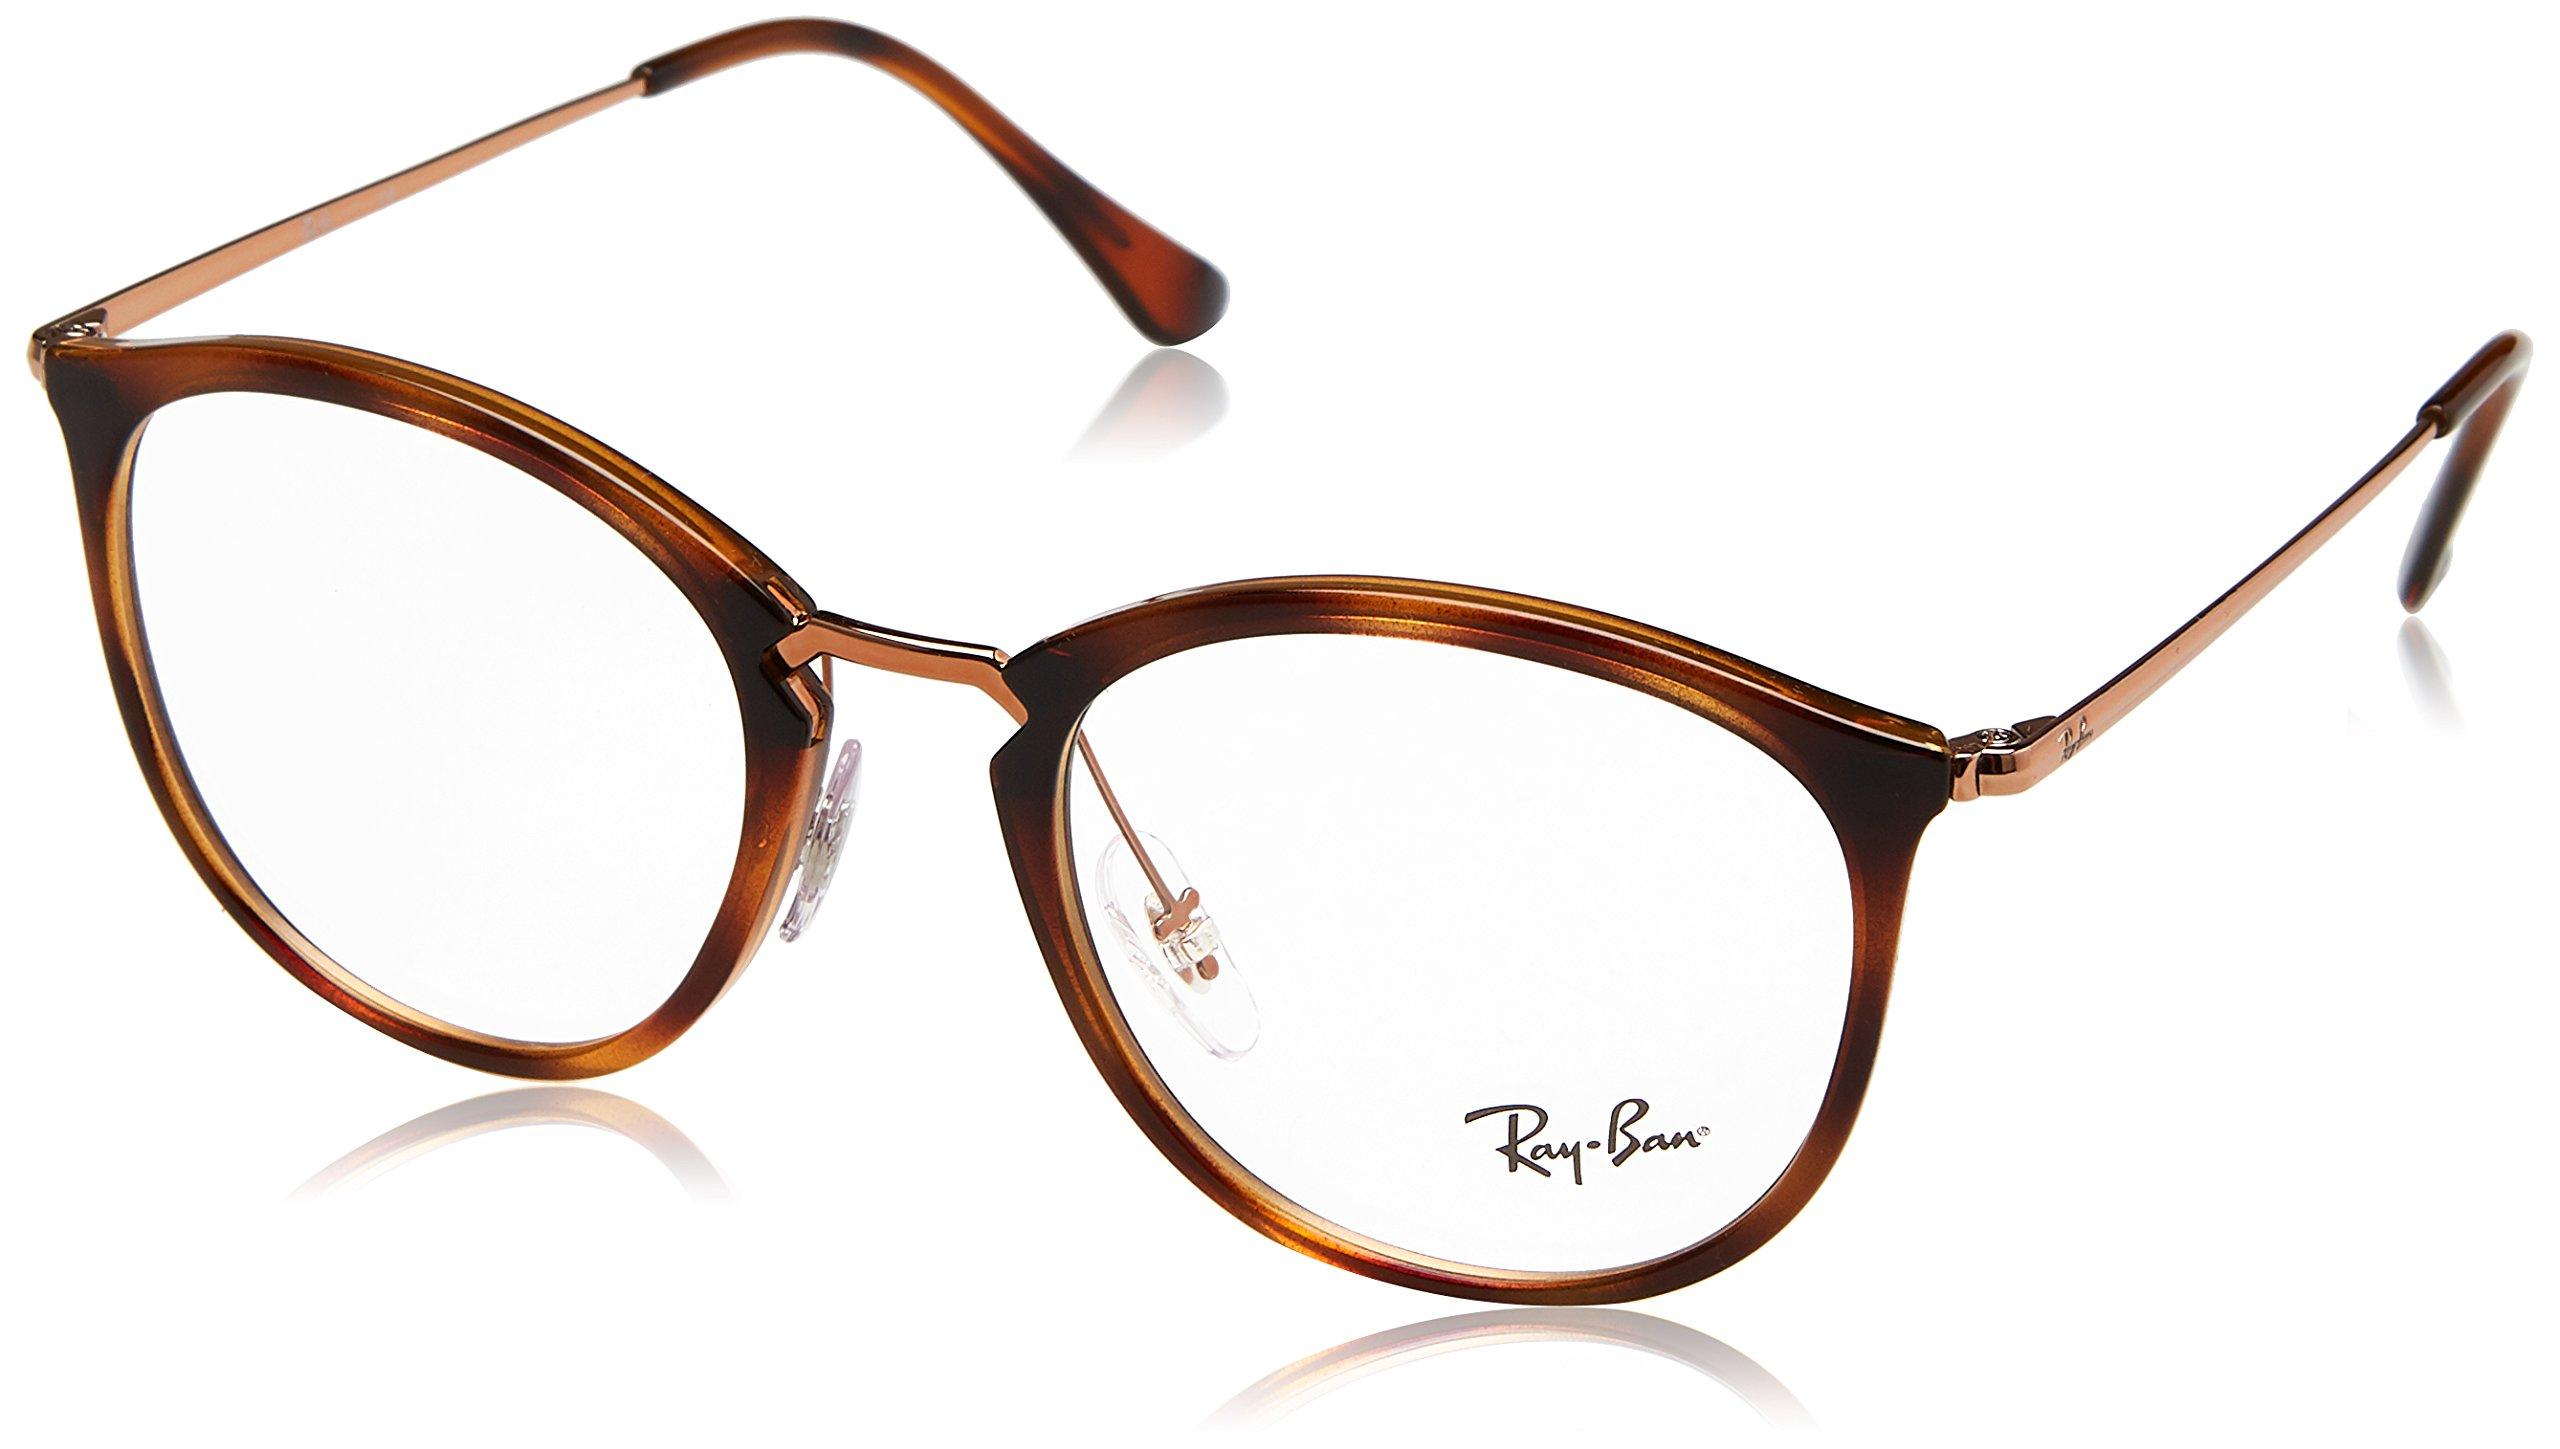 Ray-Ban RX7140 Square Eyeglass Frames, Striped Tortoise/Demo Lens, 51 mm